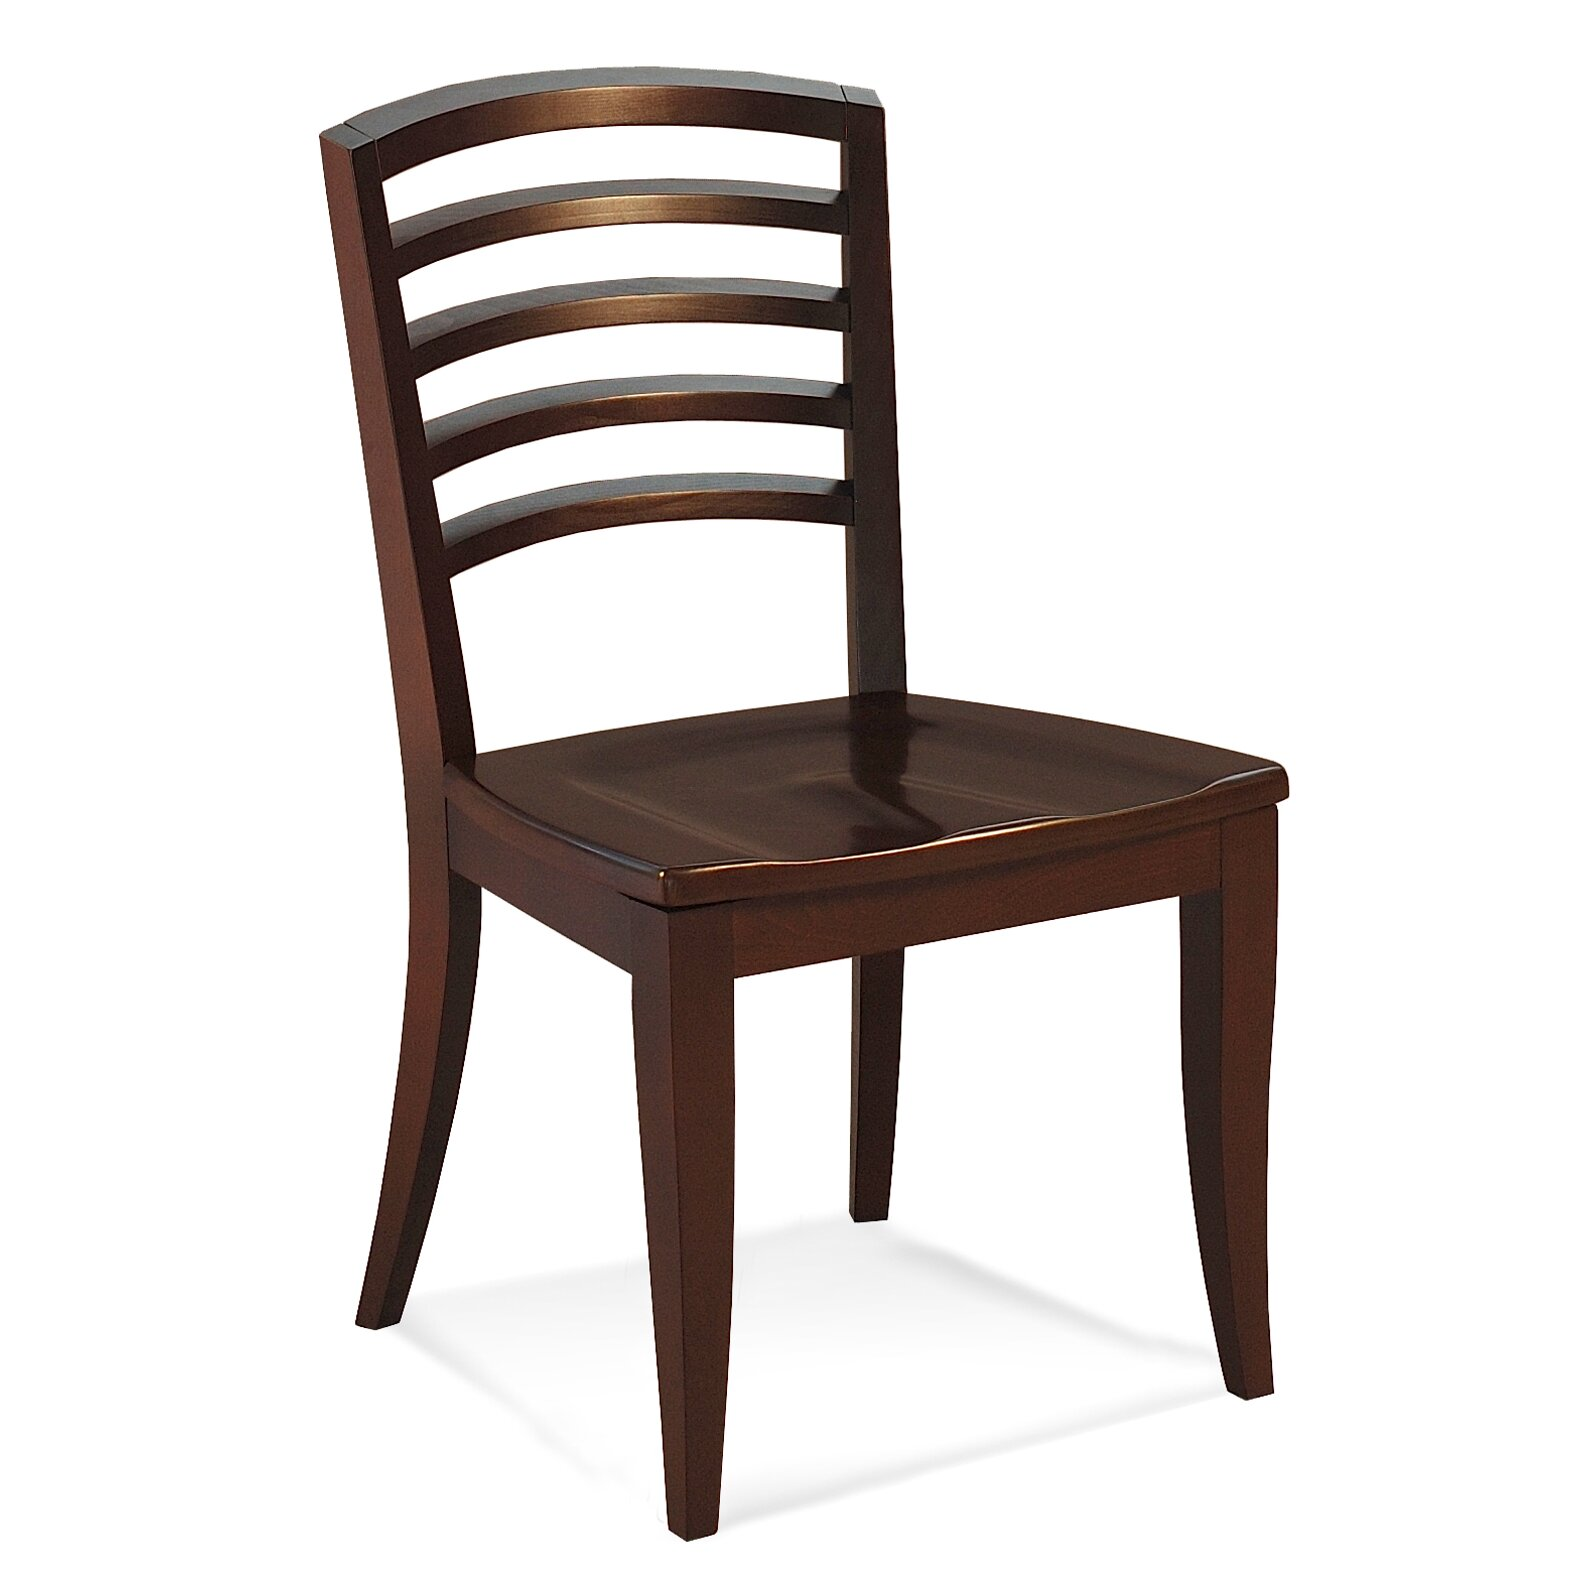 Saloom furniture peter francis side chair wayfair for Wayfair shop furniture